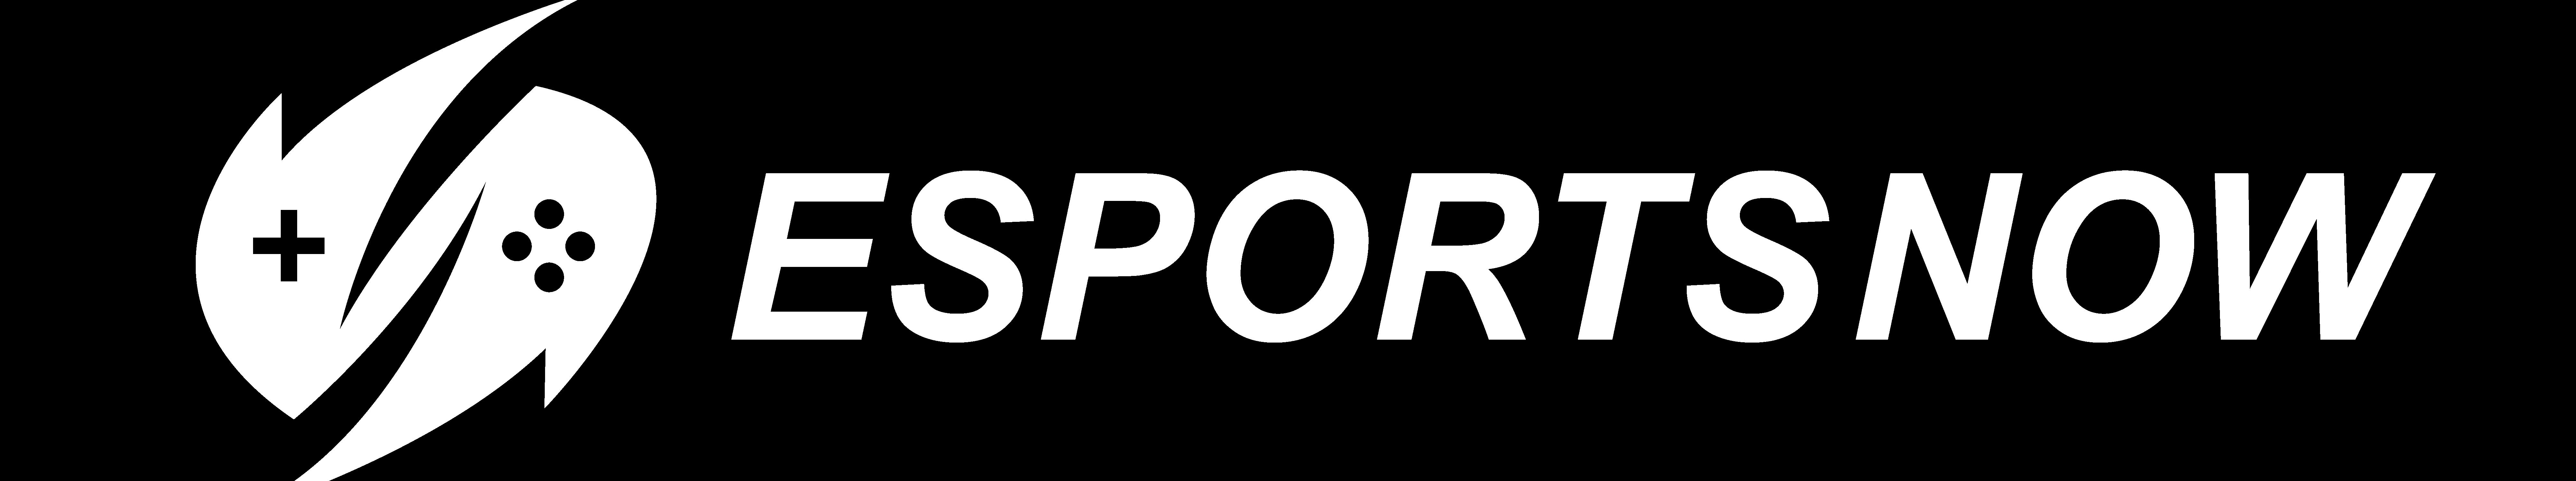 Esportsnow